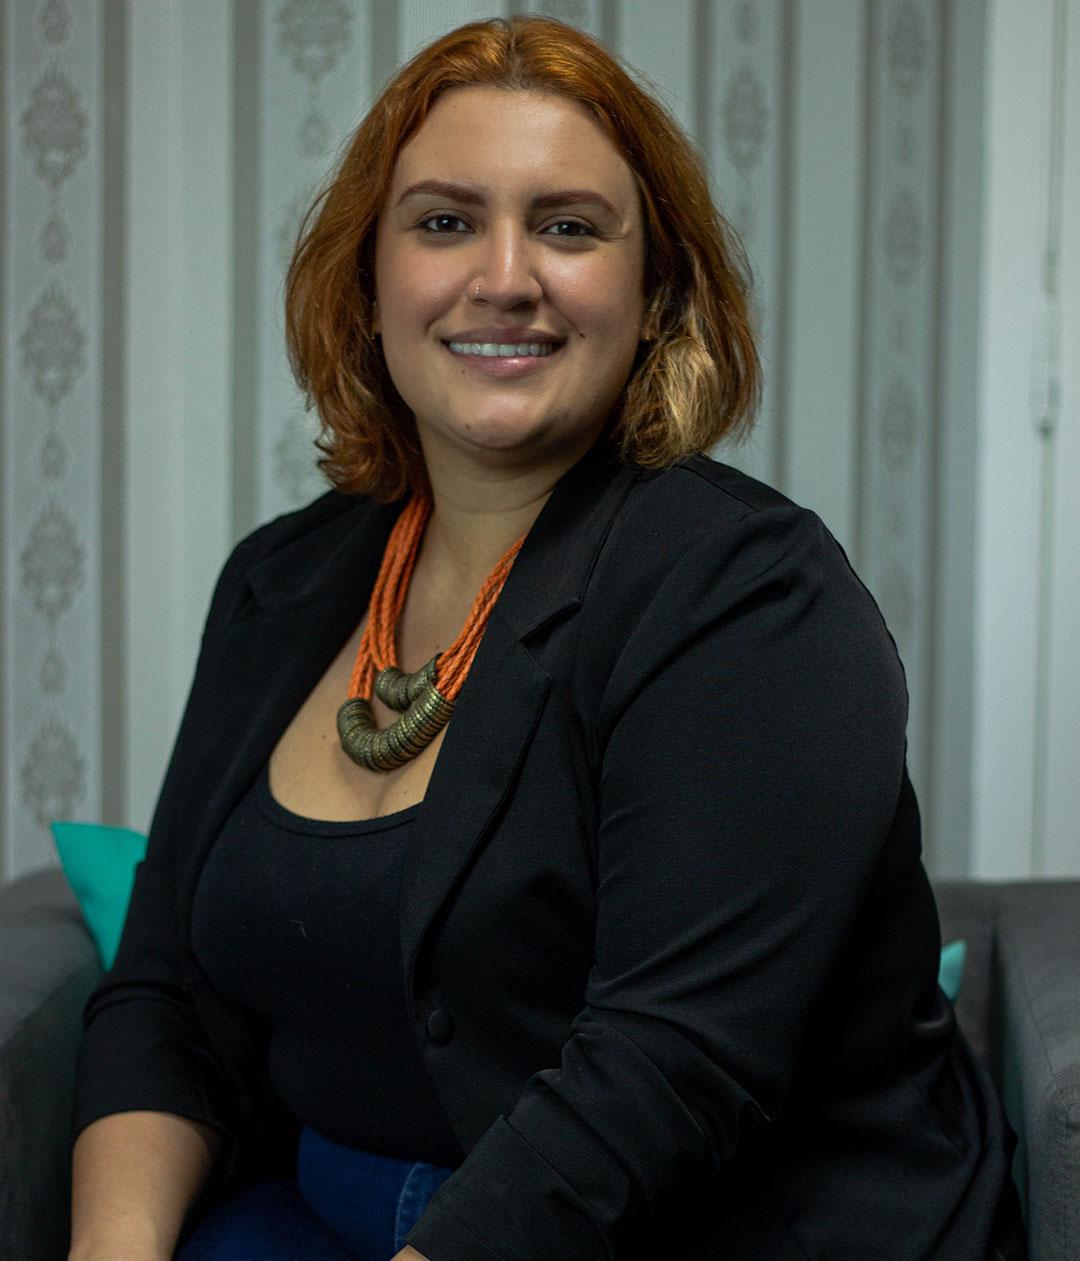 Psicóloga Ana Clara Lucas Coura